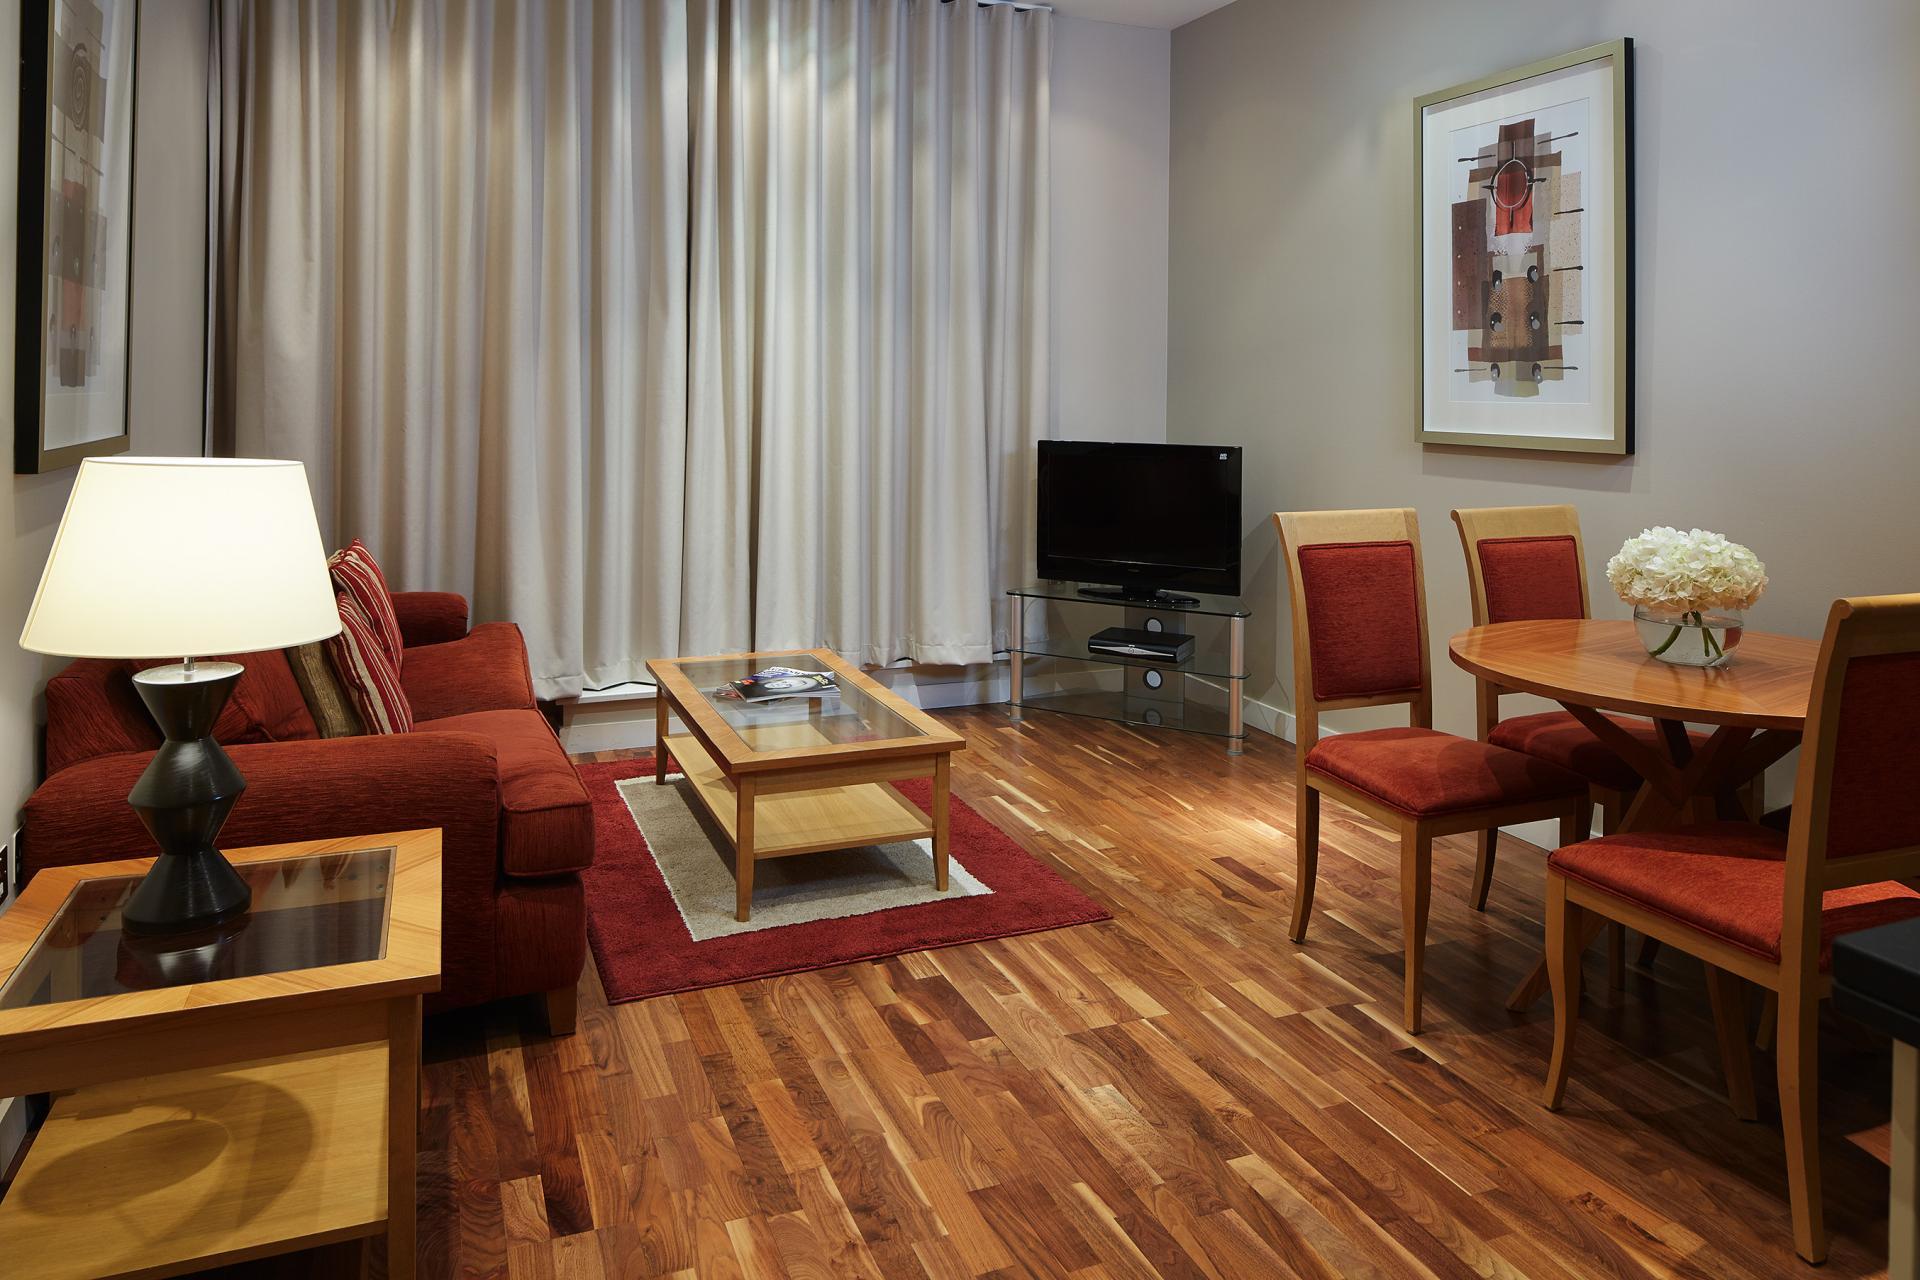 TV at Marlin Canary Wharf Apartments, Canary Wharf, London